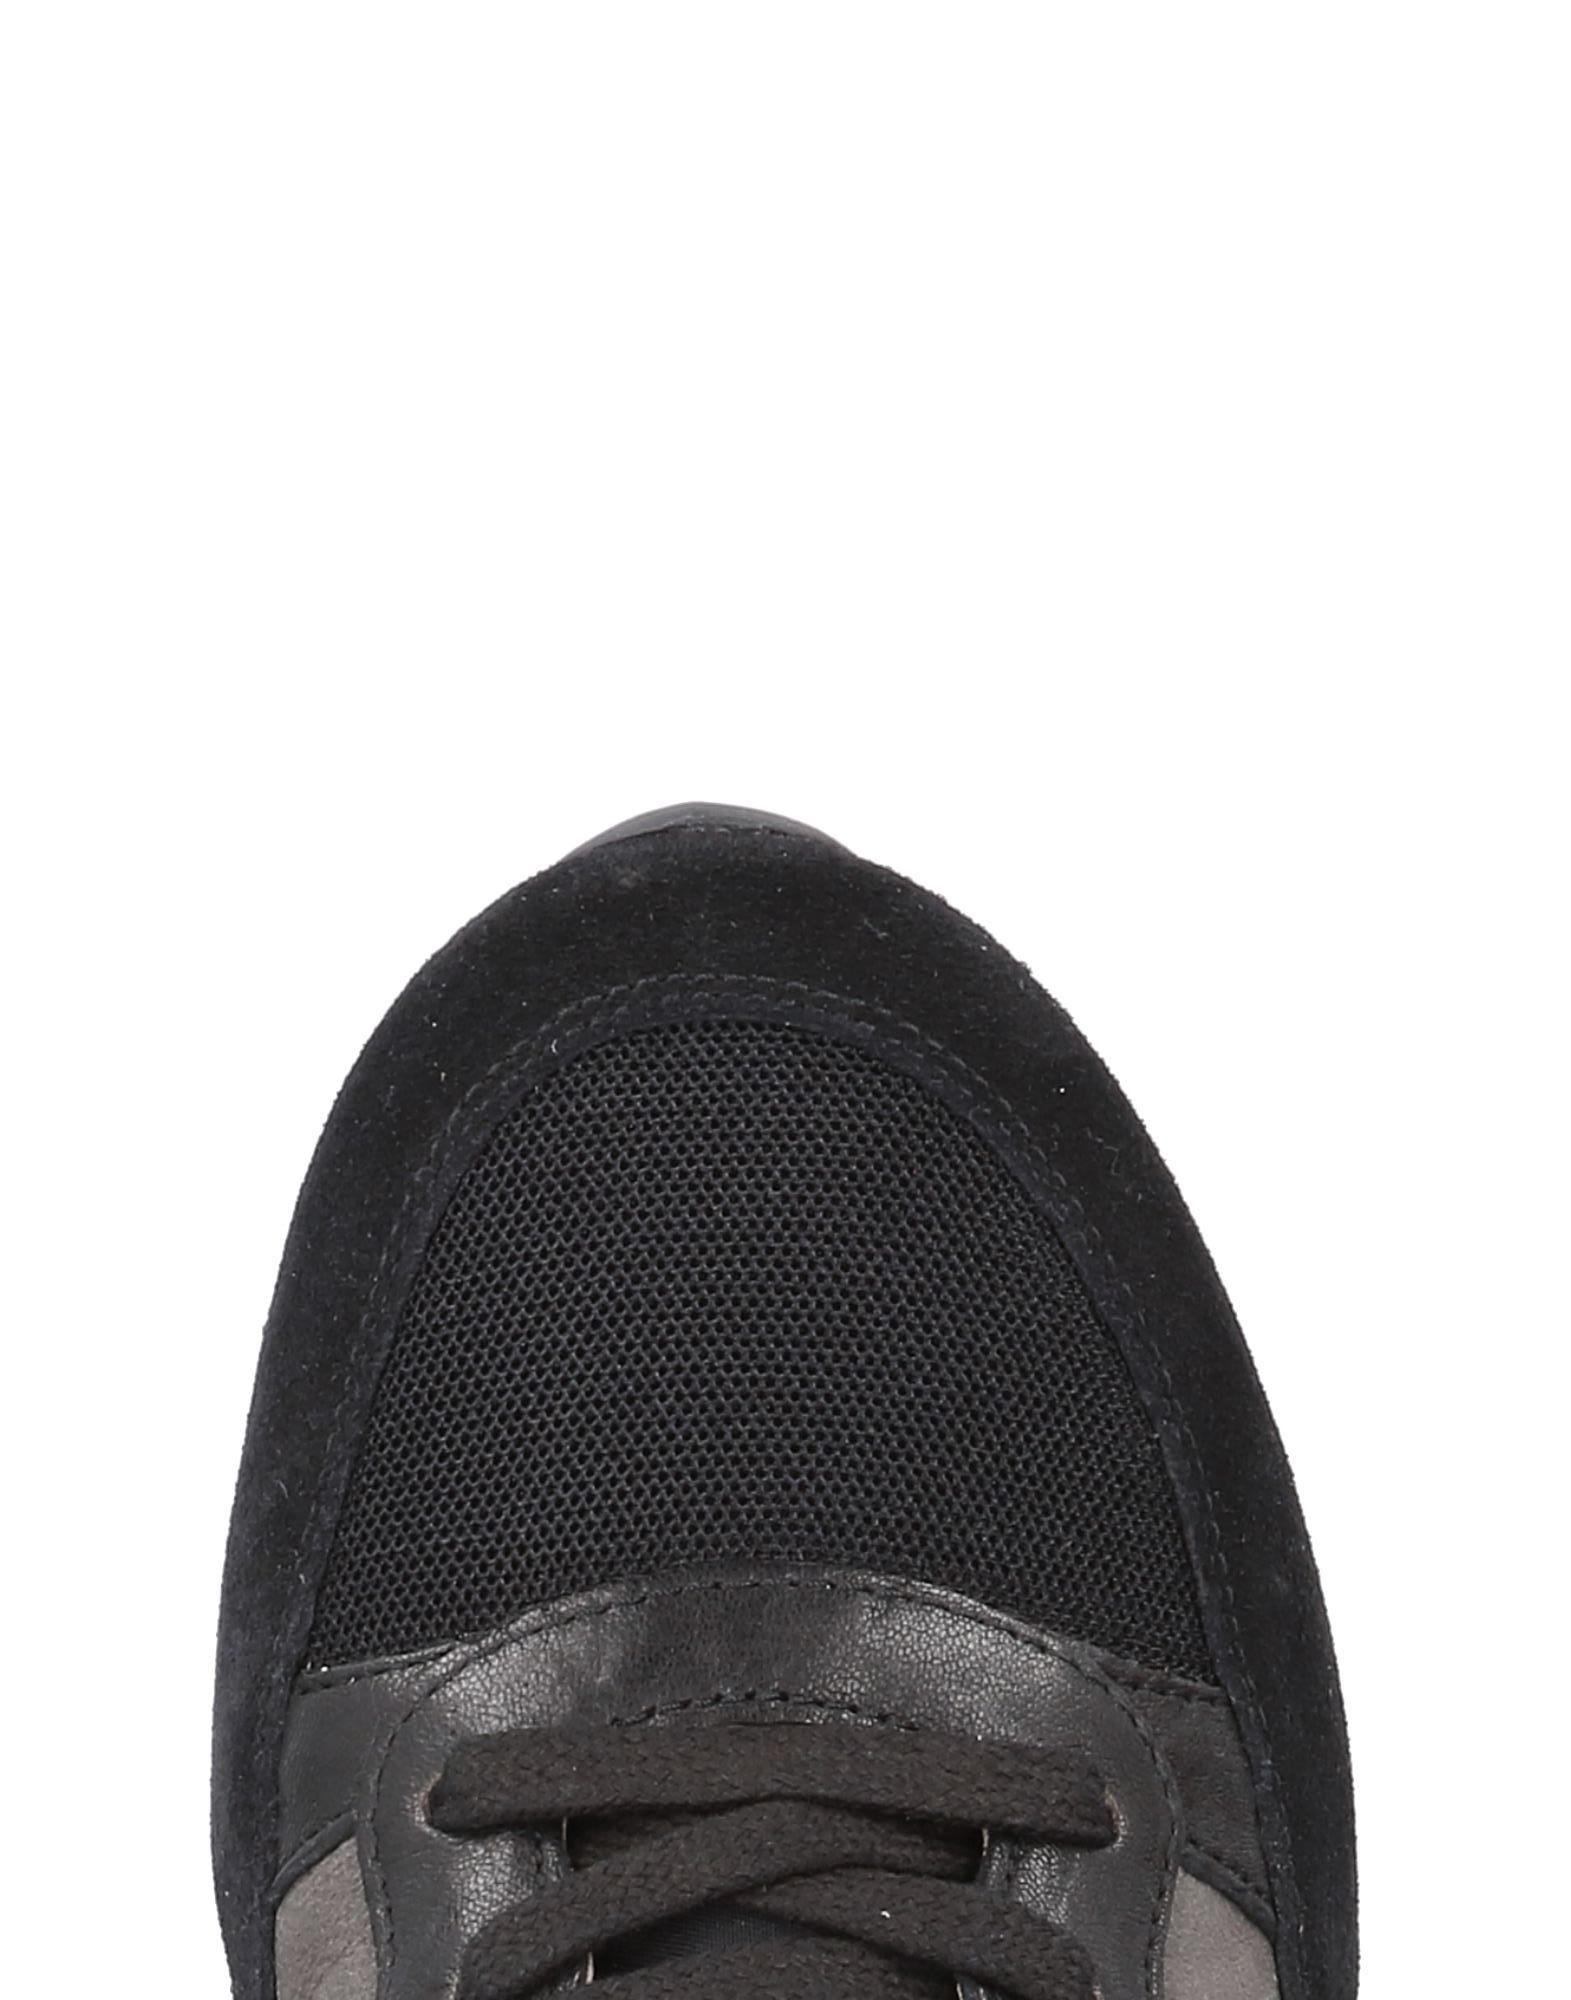 Quattrobarradodici Sneakers Herren Schuhe  11468034HE Heiße Schuhe Herren 1d3ba0